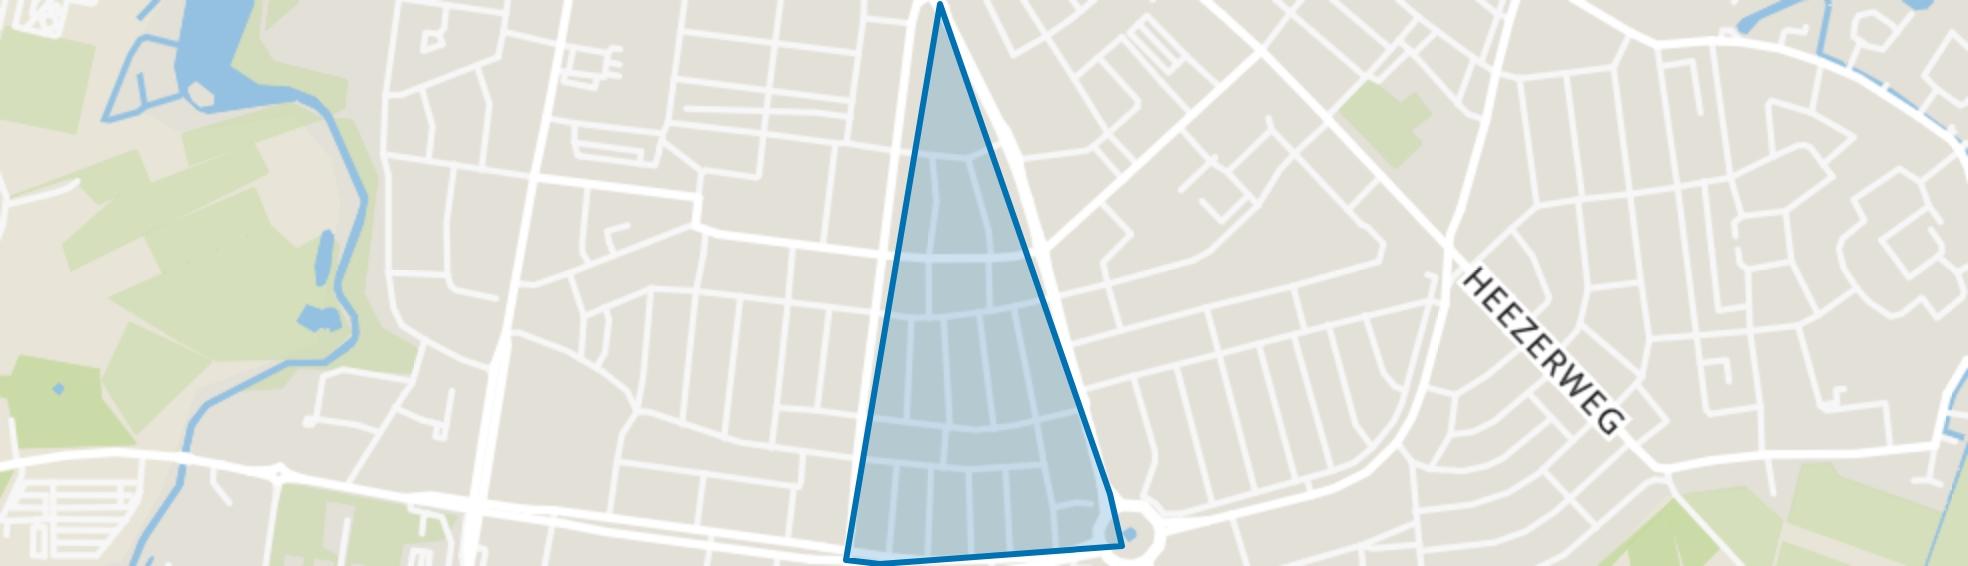 Kerstroosplein, Eindhoven map